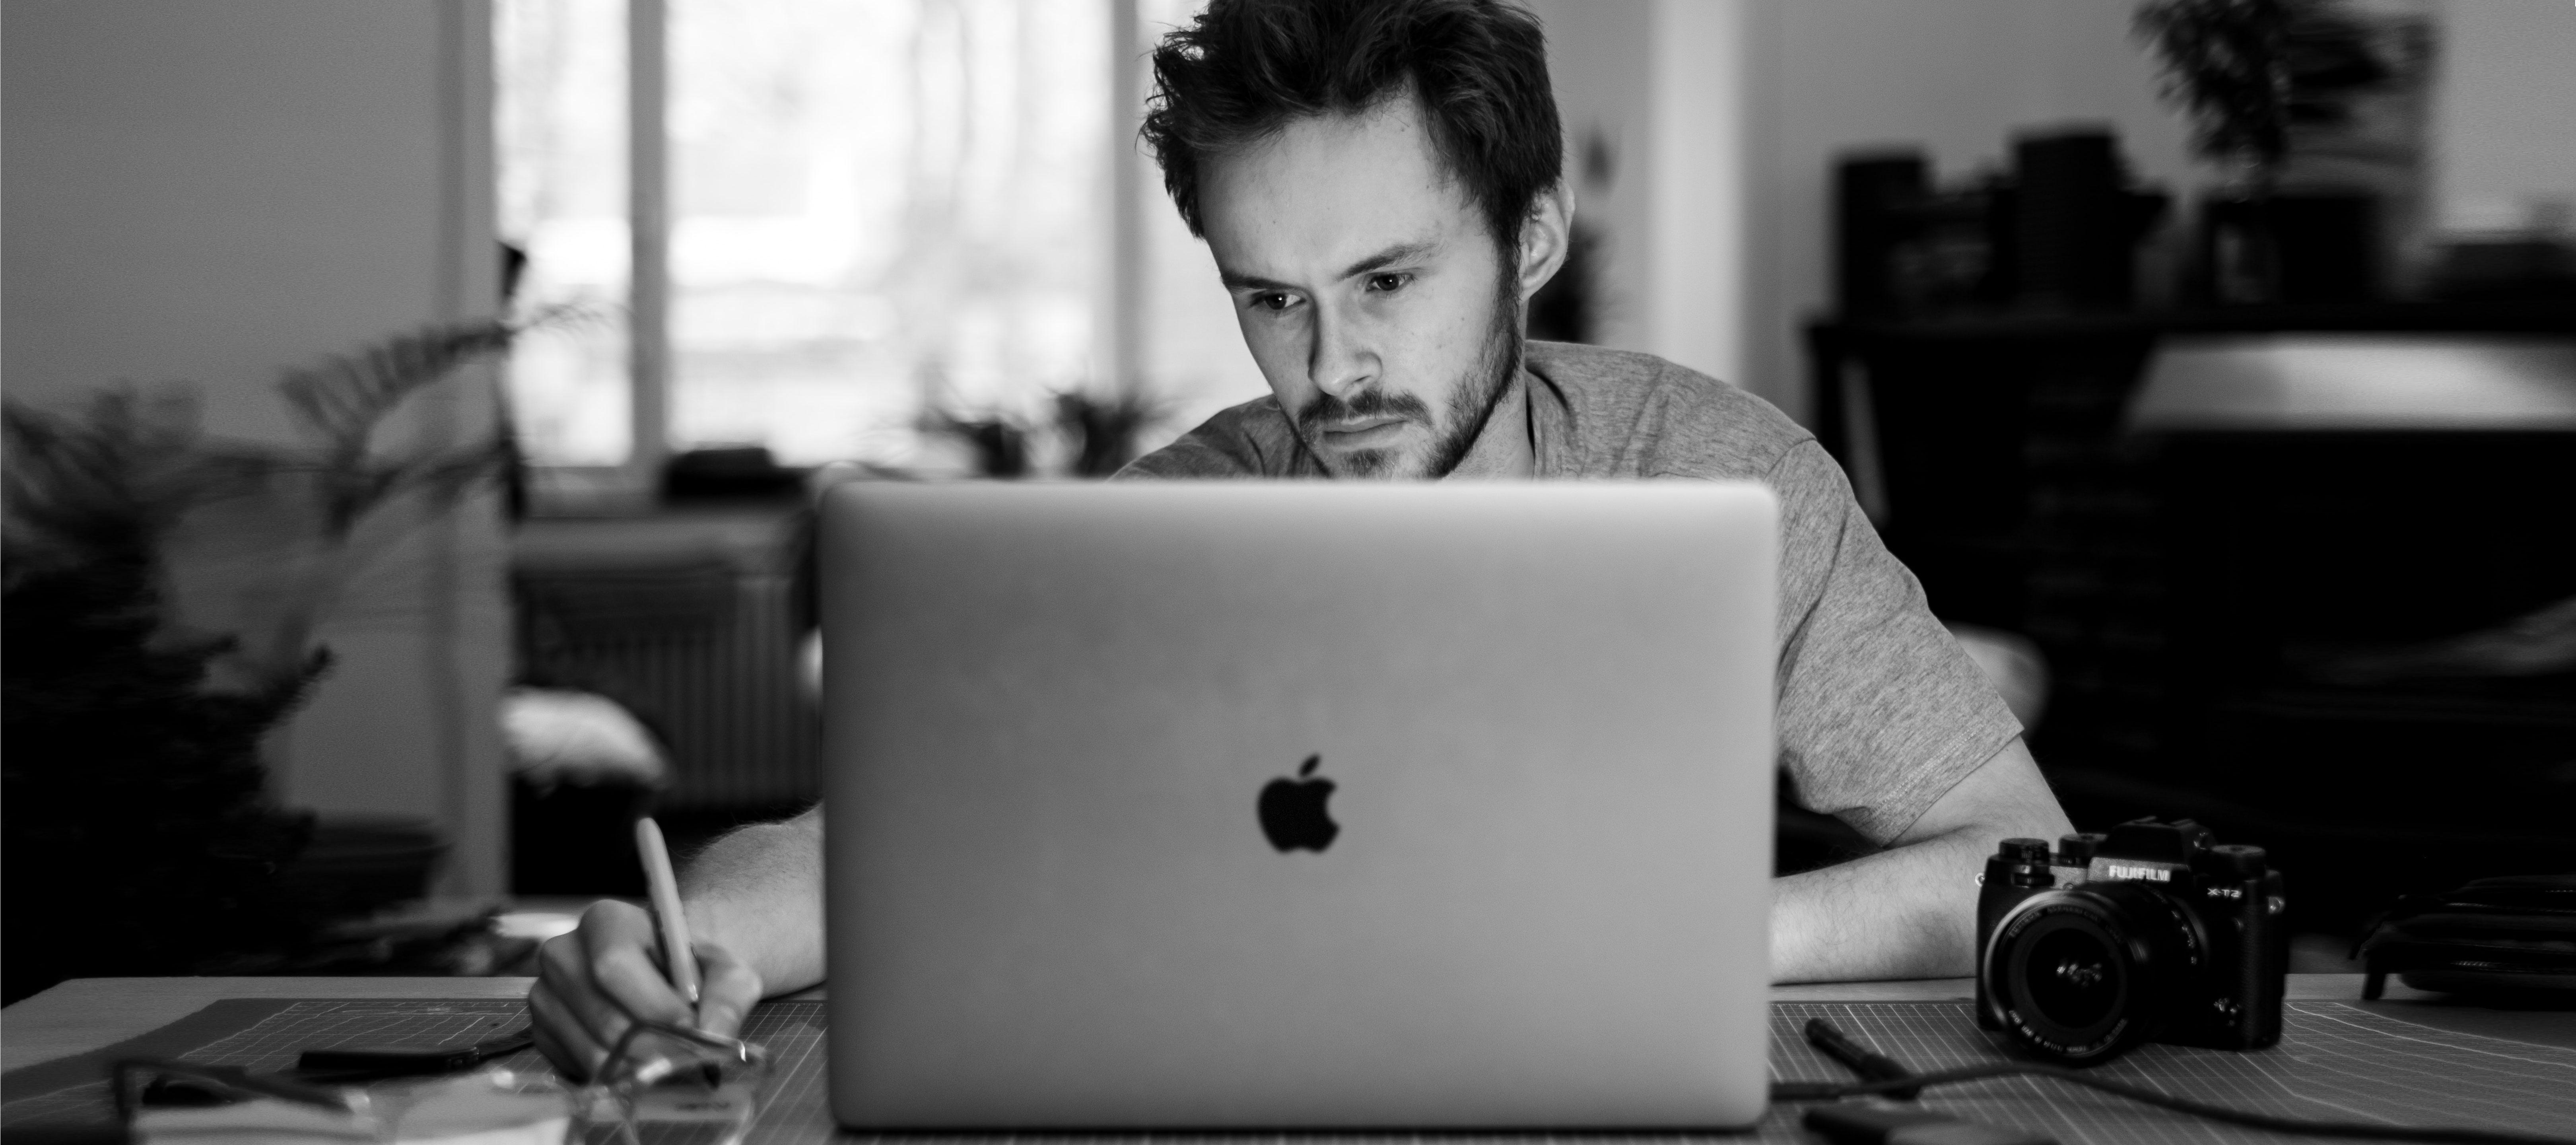 heroic-fundraising-blog-featured-image-man-computer-camera